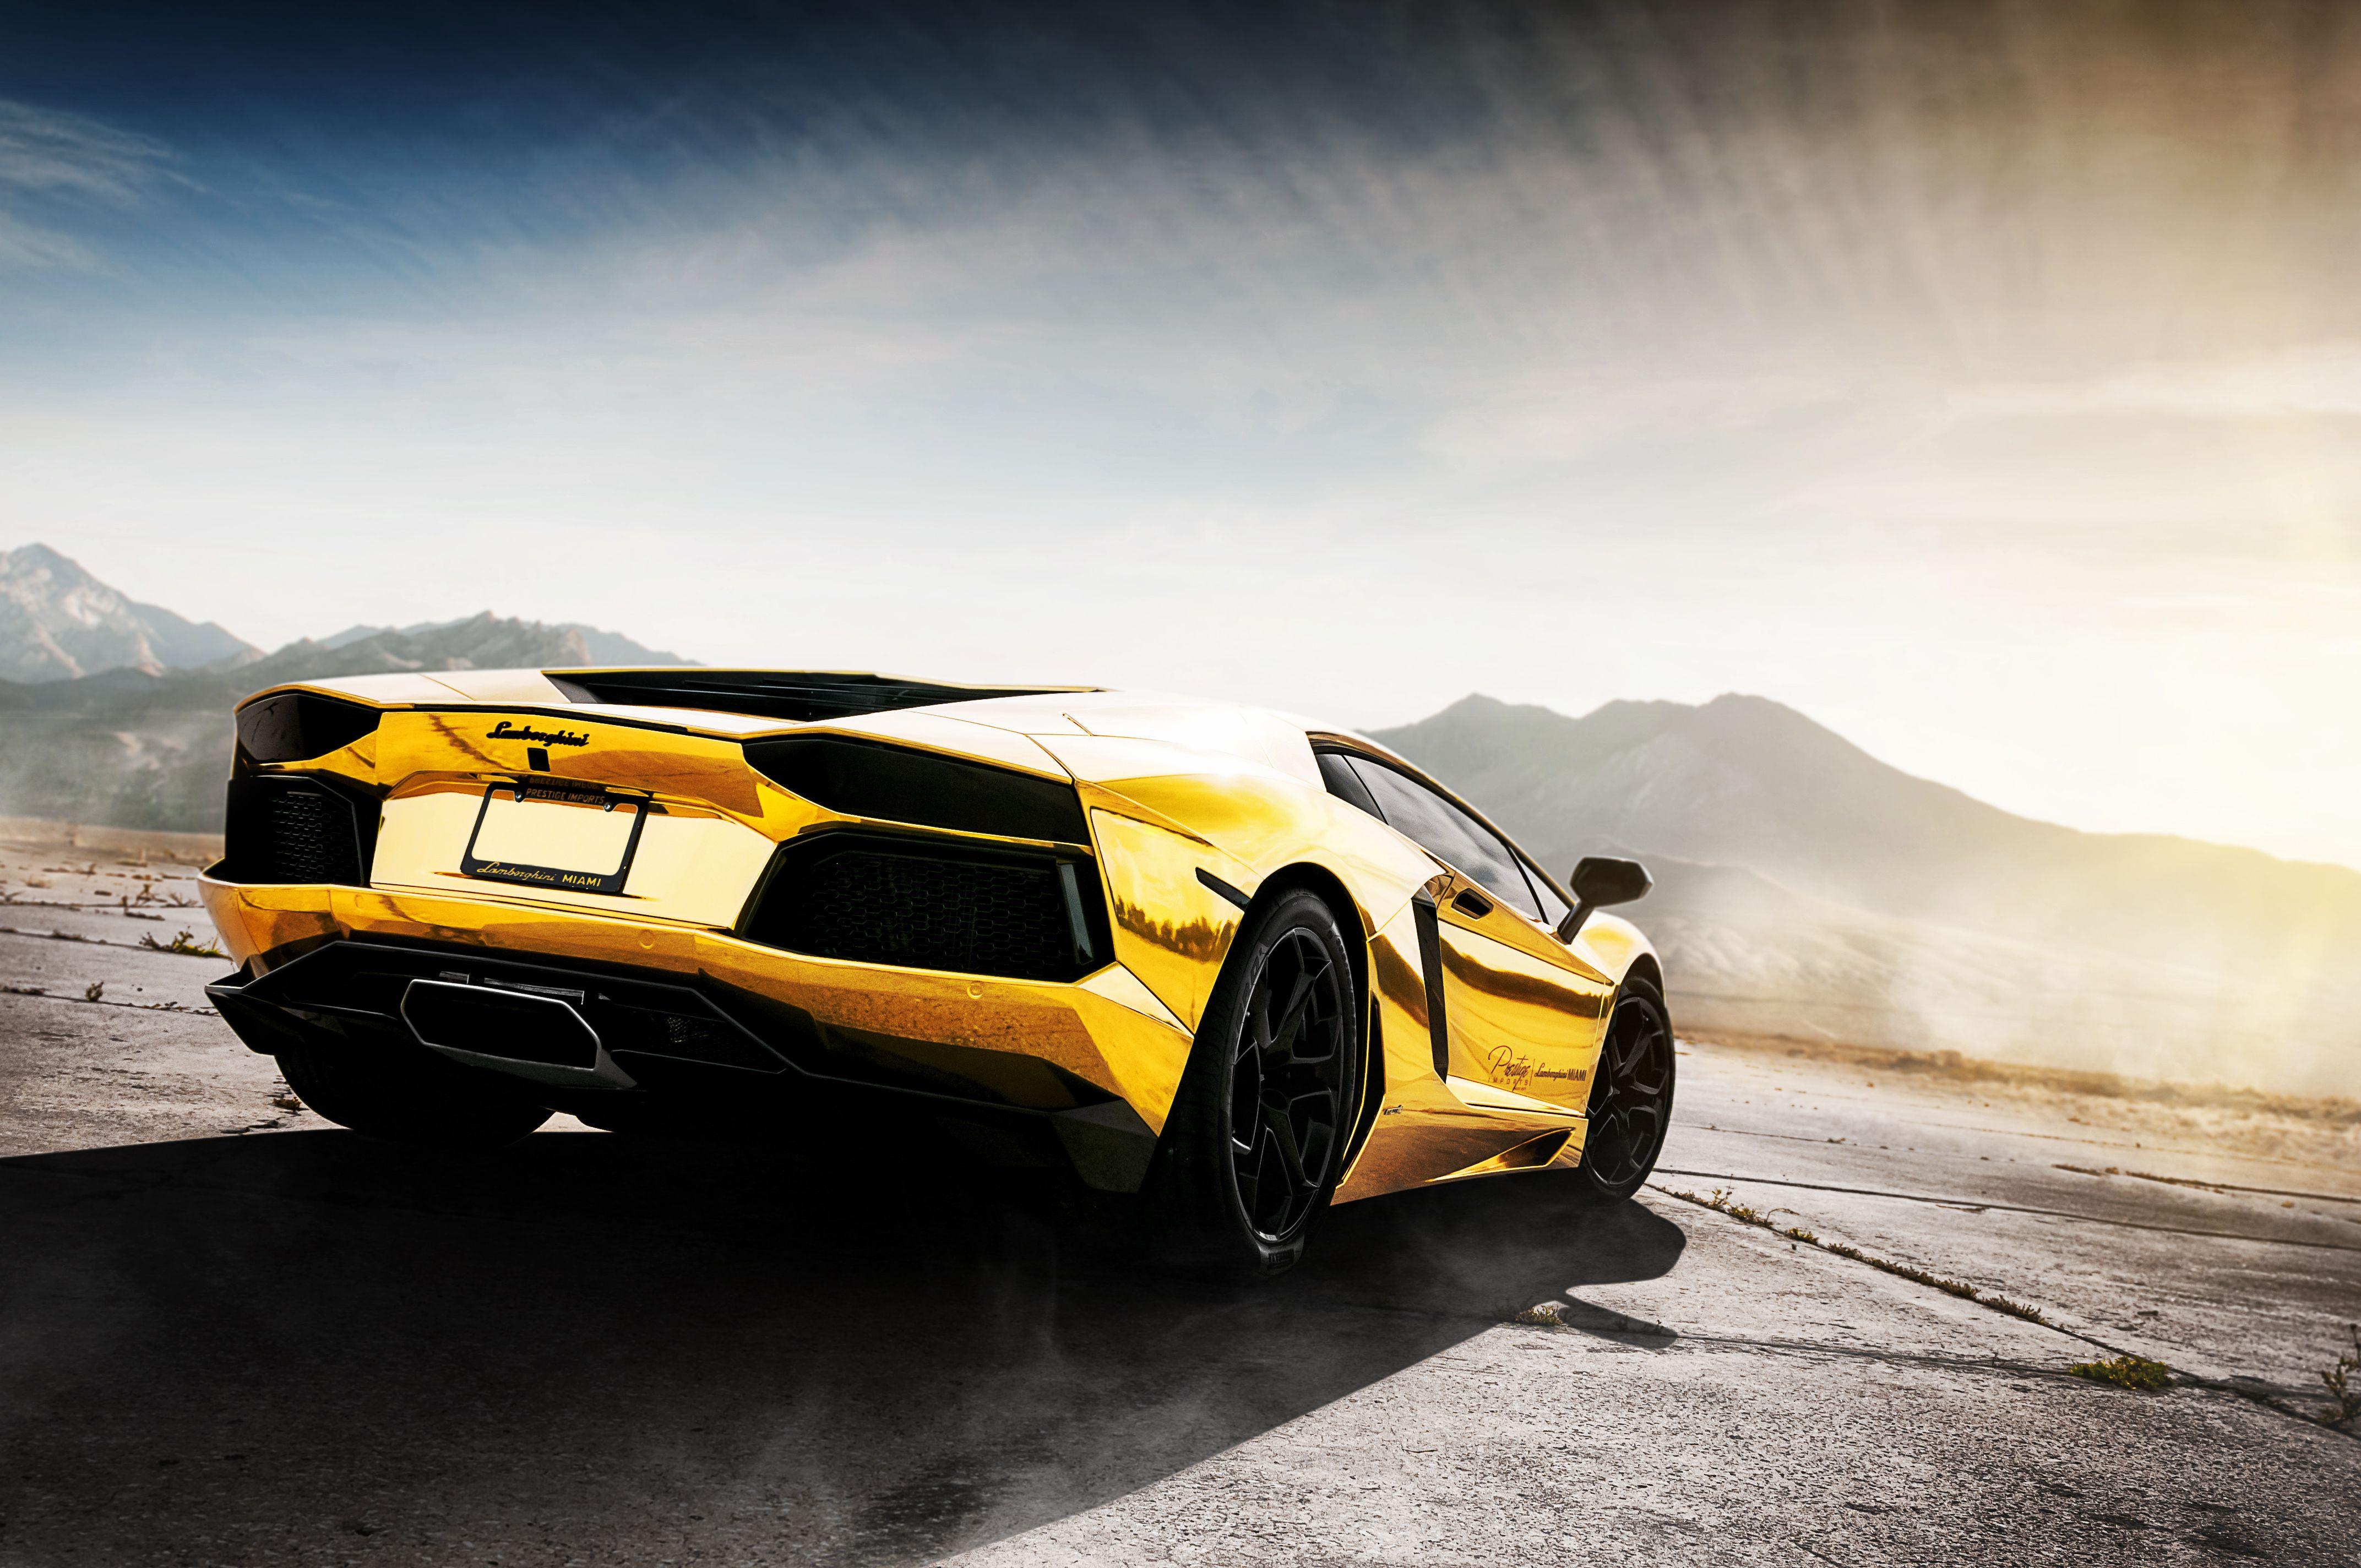 Lamborghini Aventador Gold 2355 Full Hd Wallpaper Desktop Res Lamborghini Veneno Best Lamborghini Lamborghini Aventador